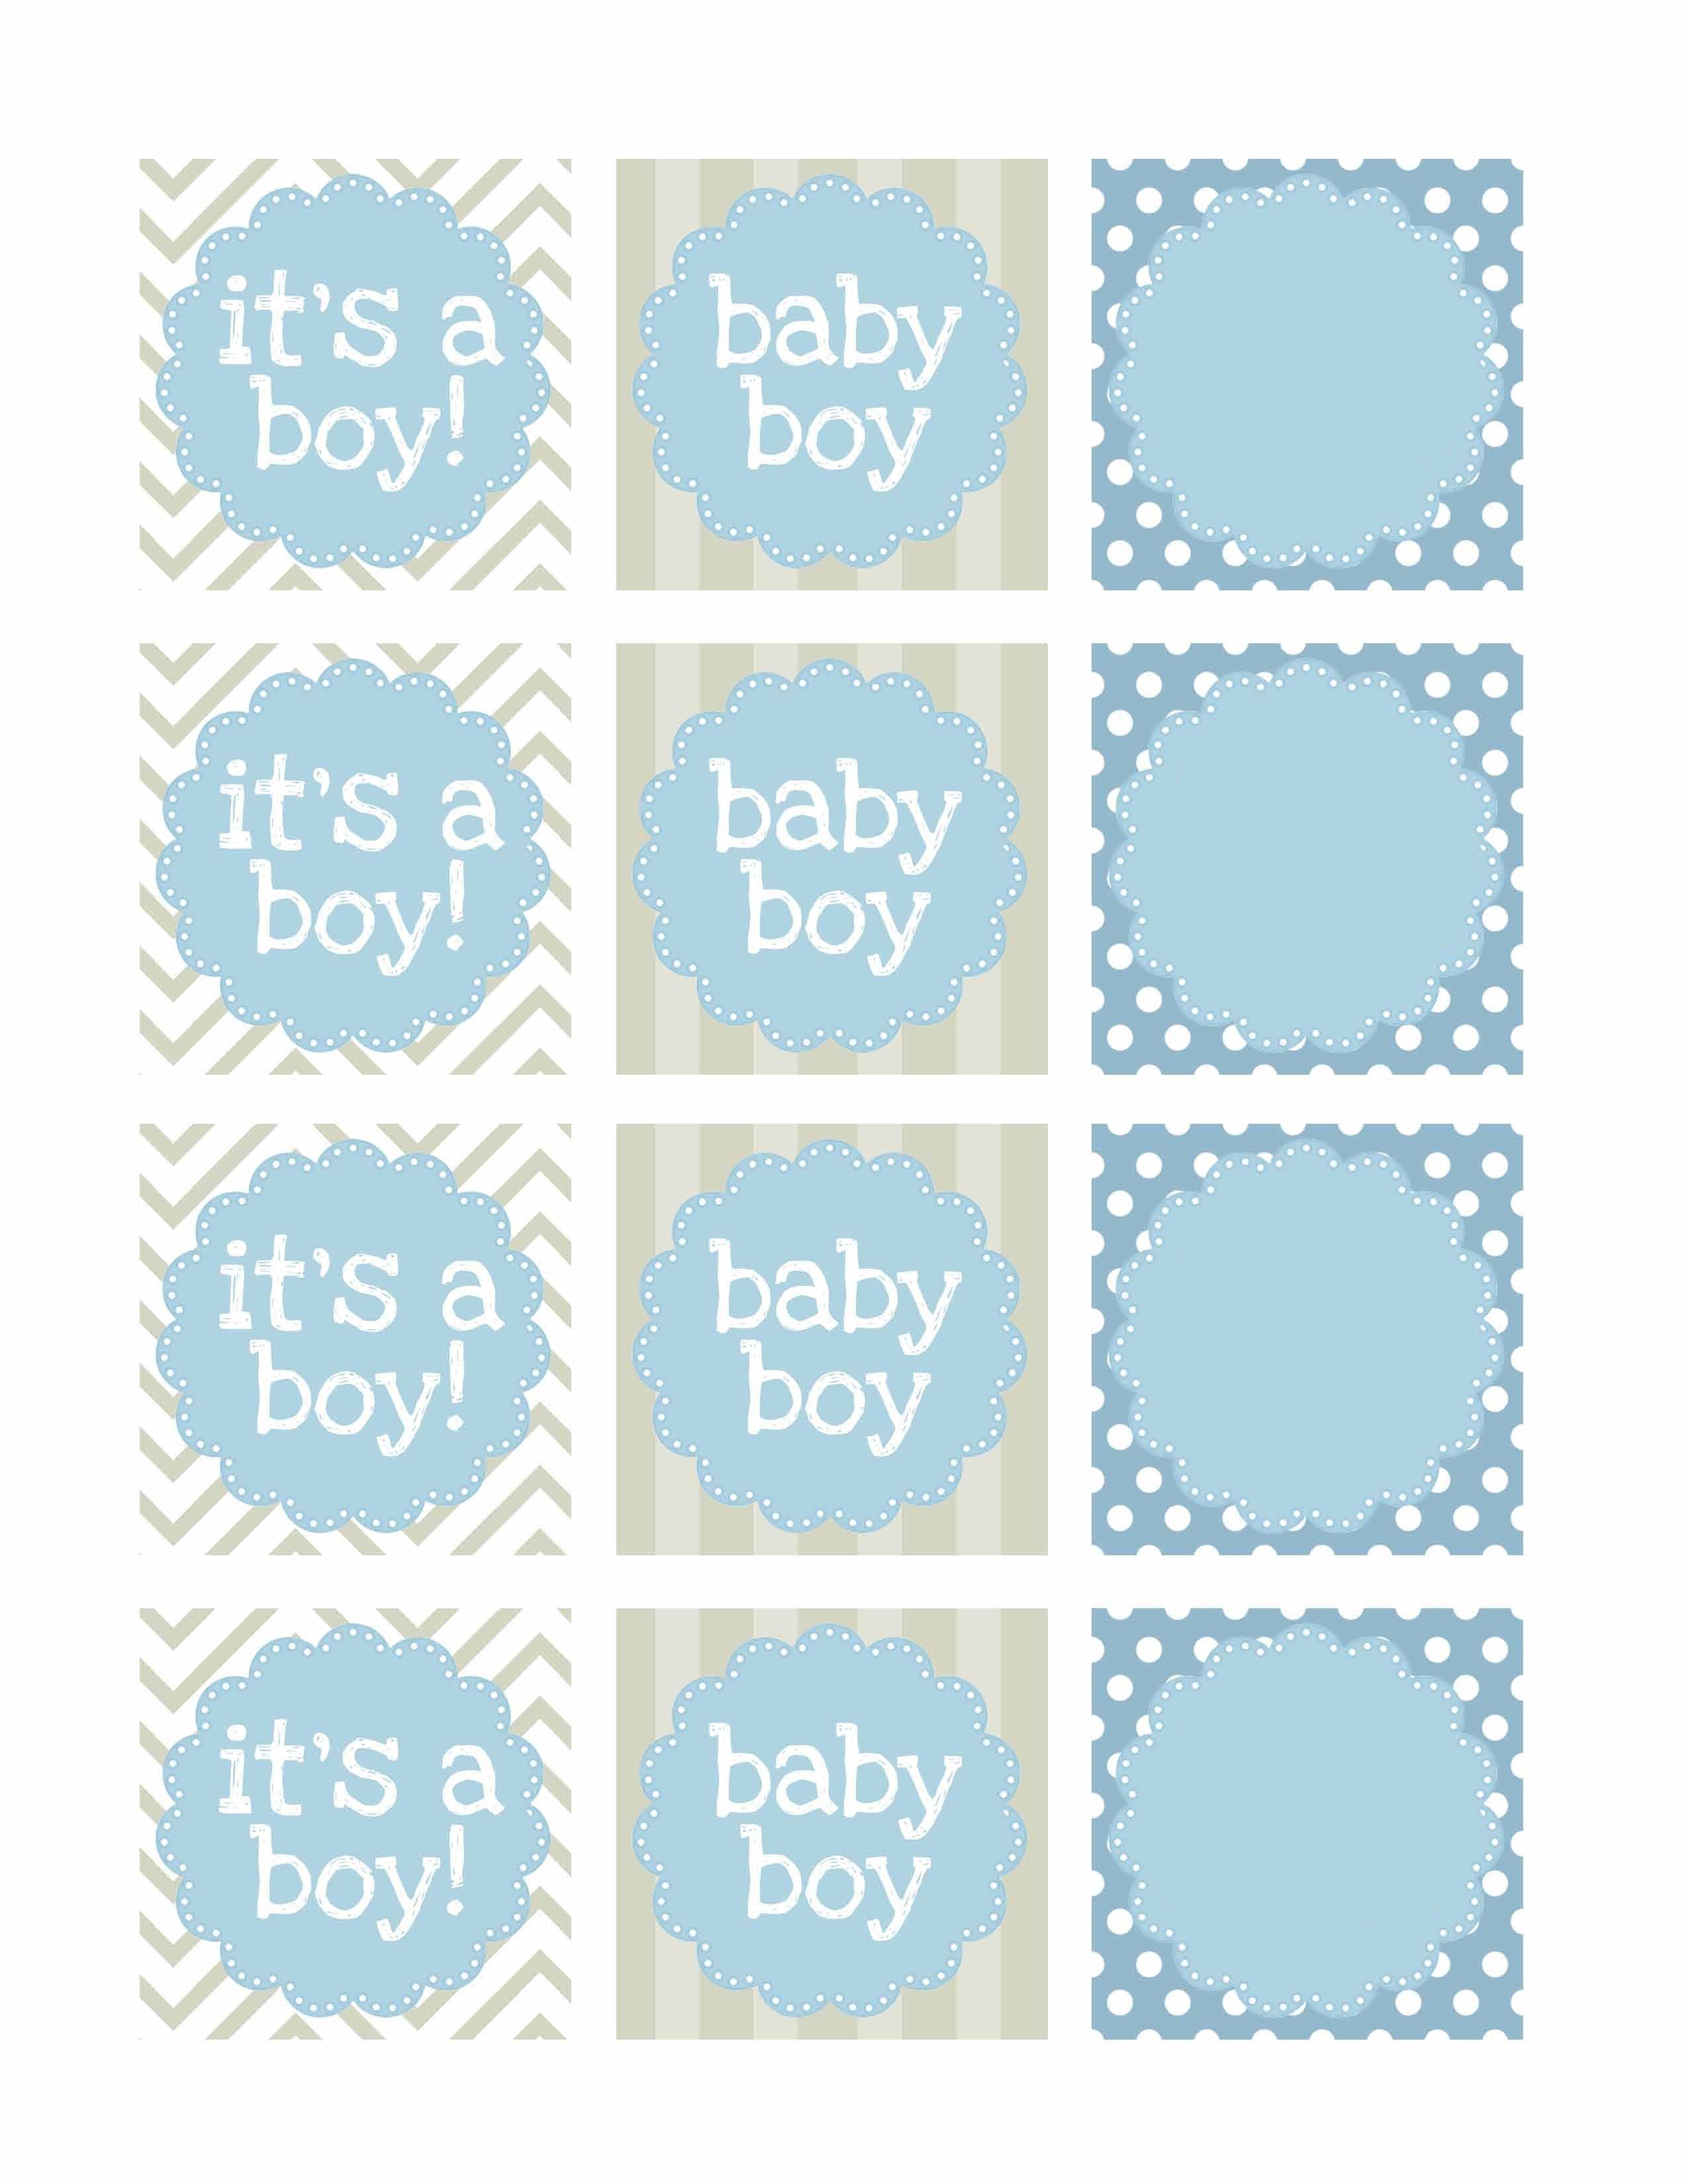 Boy Baby Shower Free Printables | Printable | Návody, Nápady, Tisk - Free Printable Baby Shower Favor Tags